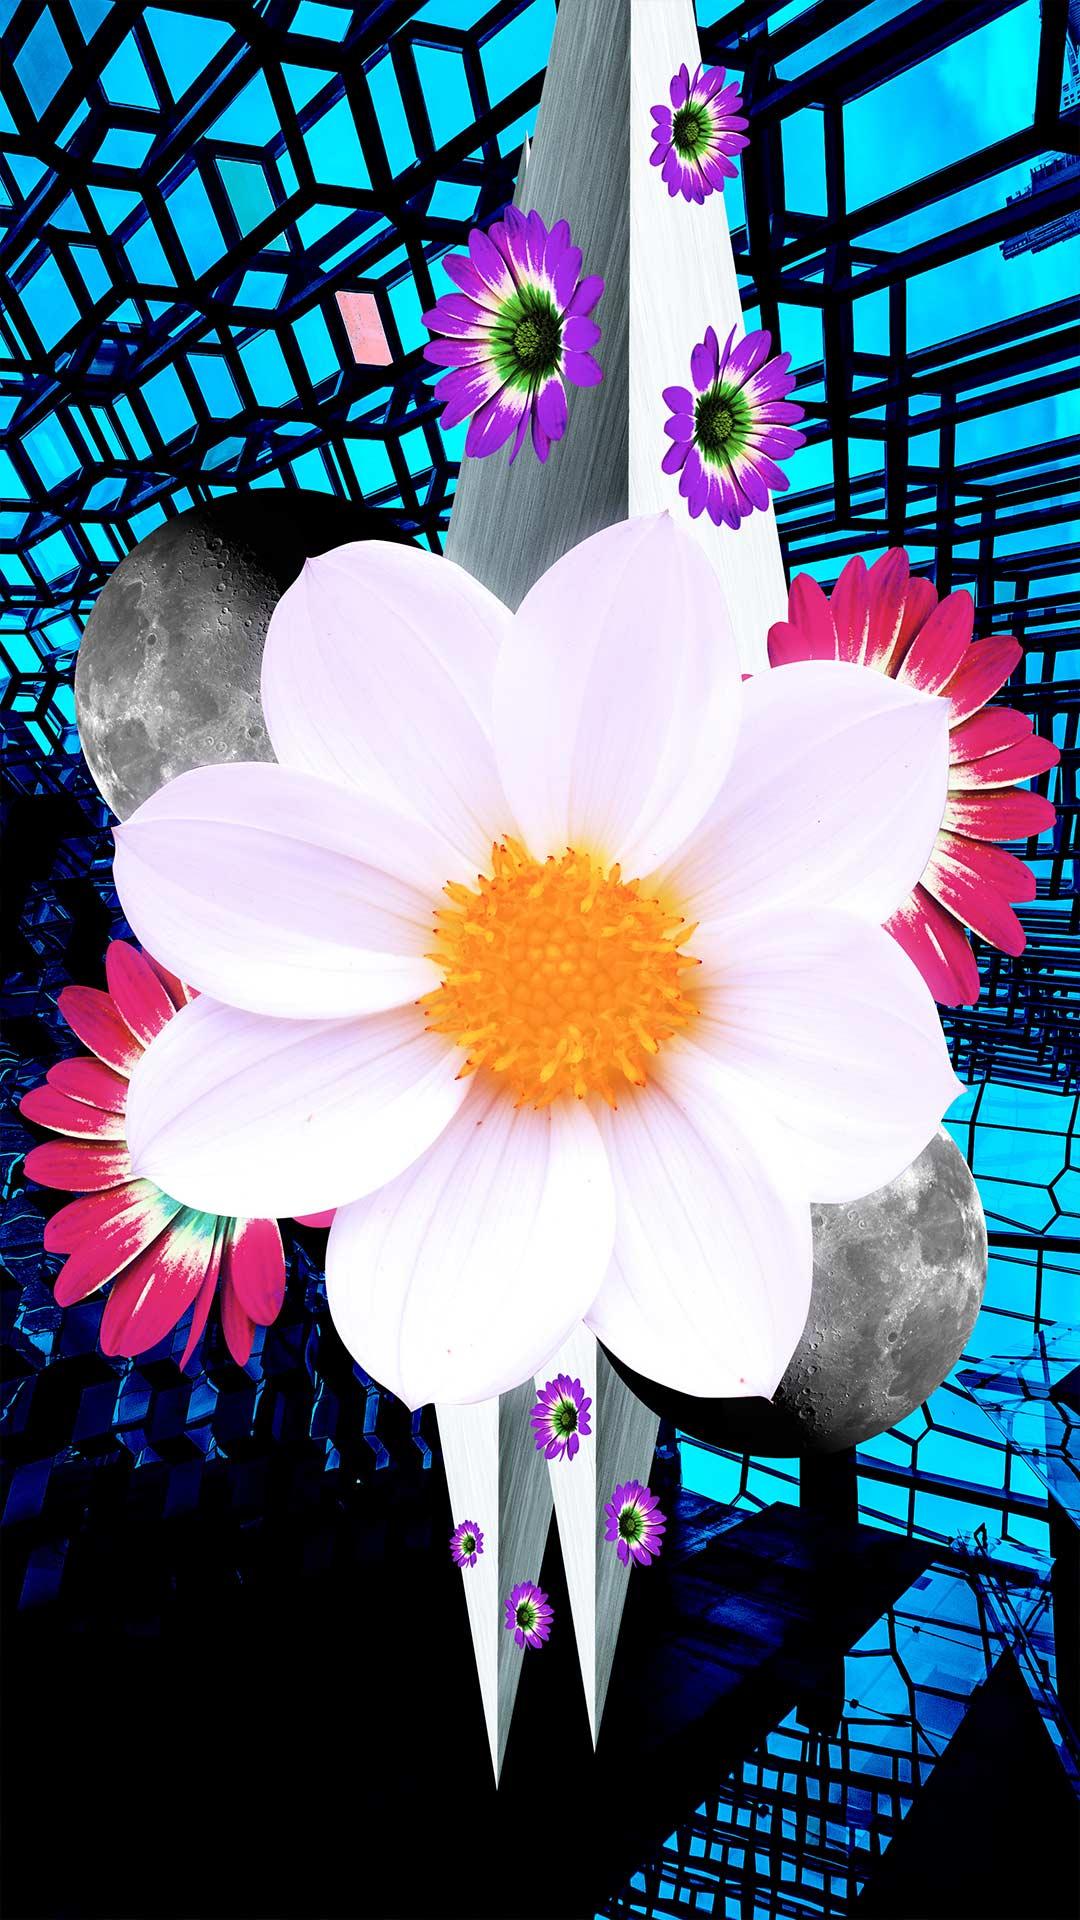 Blend_Pixels.jpg